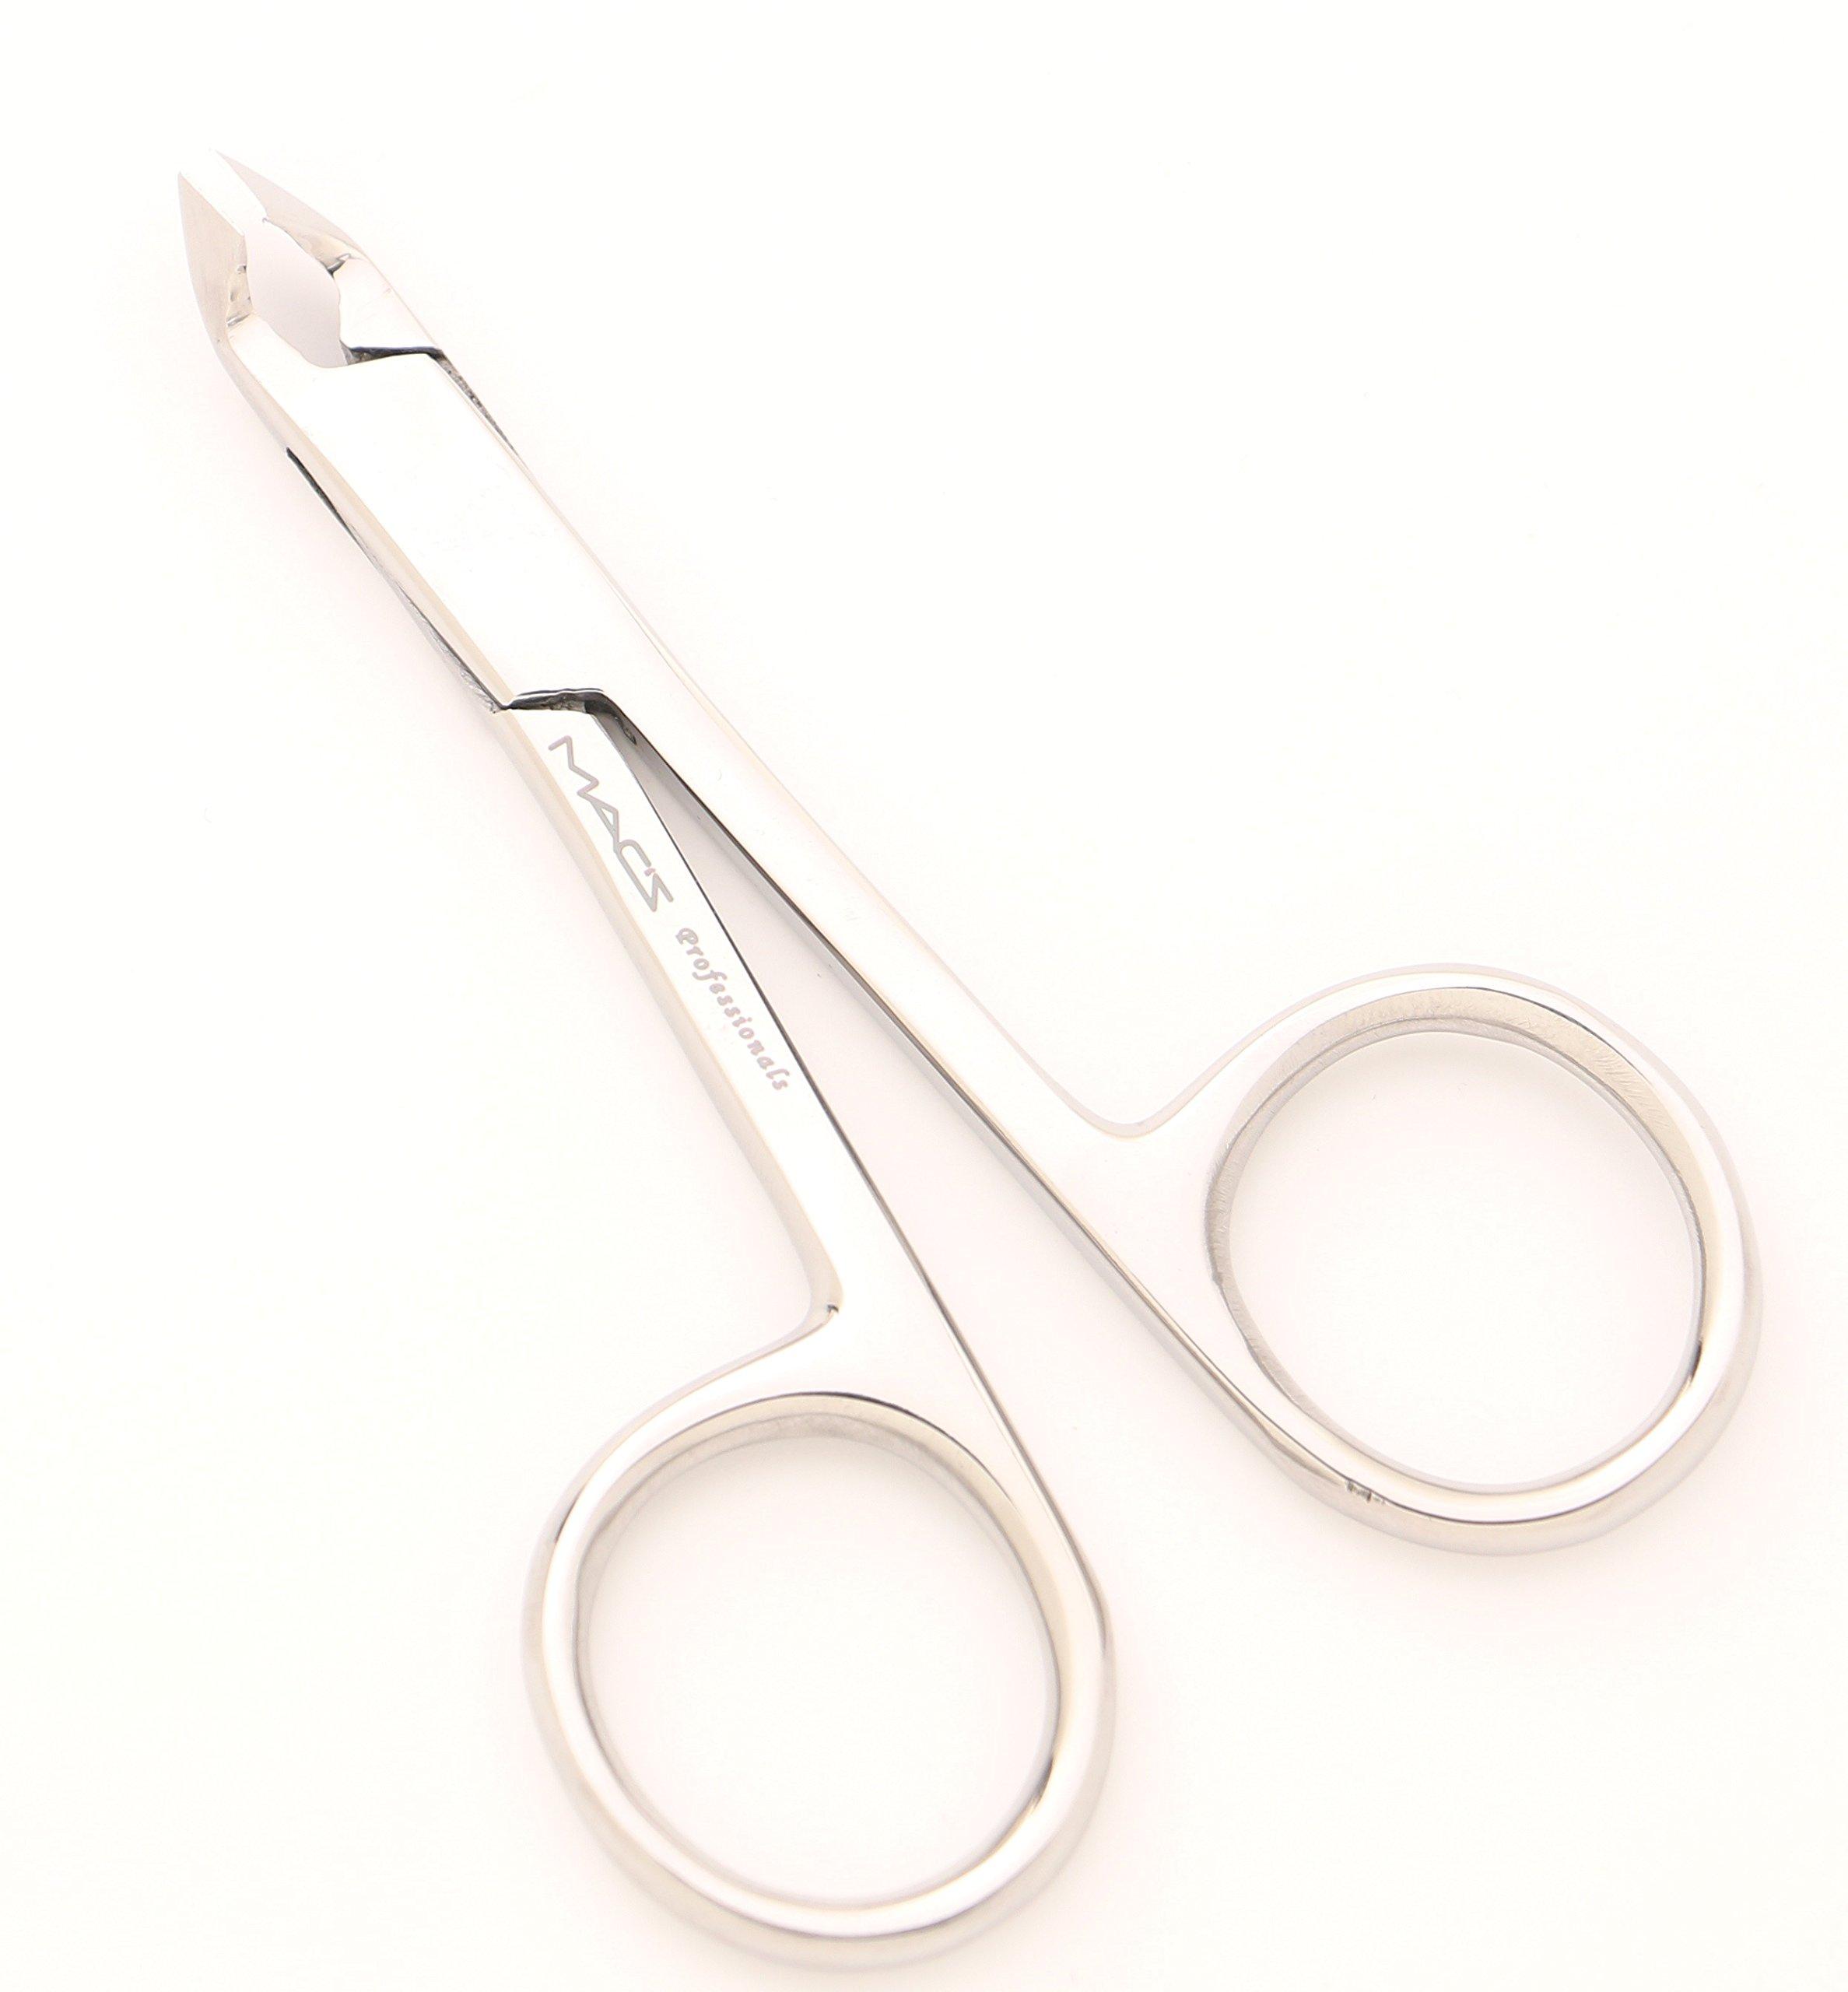 MACS CUTICLE NIPPER SCISSORS STYLE ,Cuticle Clipper, Nail Clipper,With Scissors Style,Mini Clipper/Nipper -Half Jaw Professional Quality, Stainless Steel -4-029